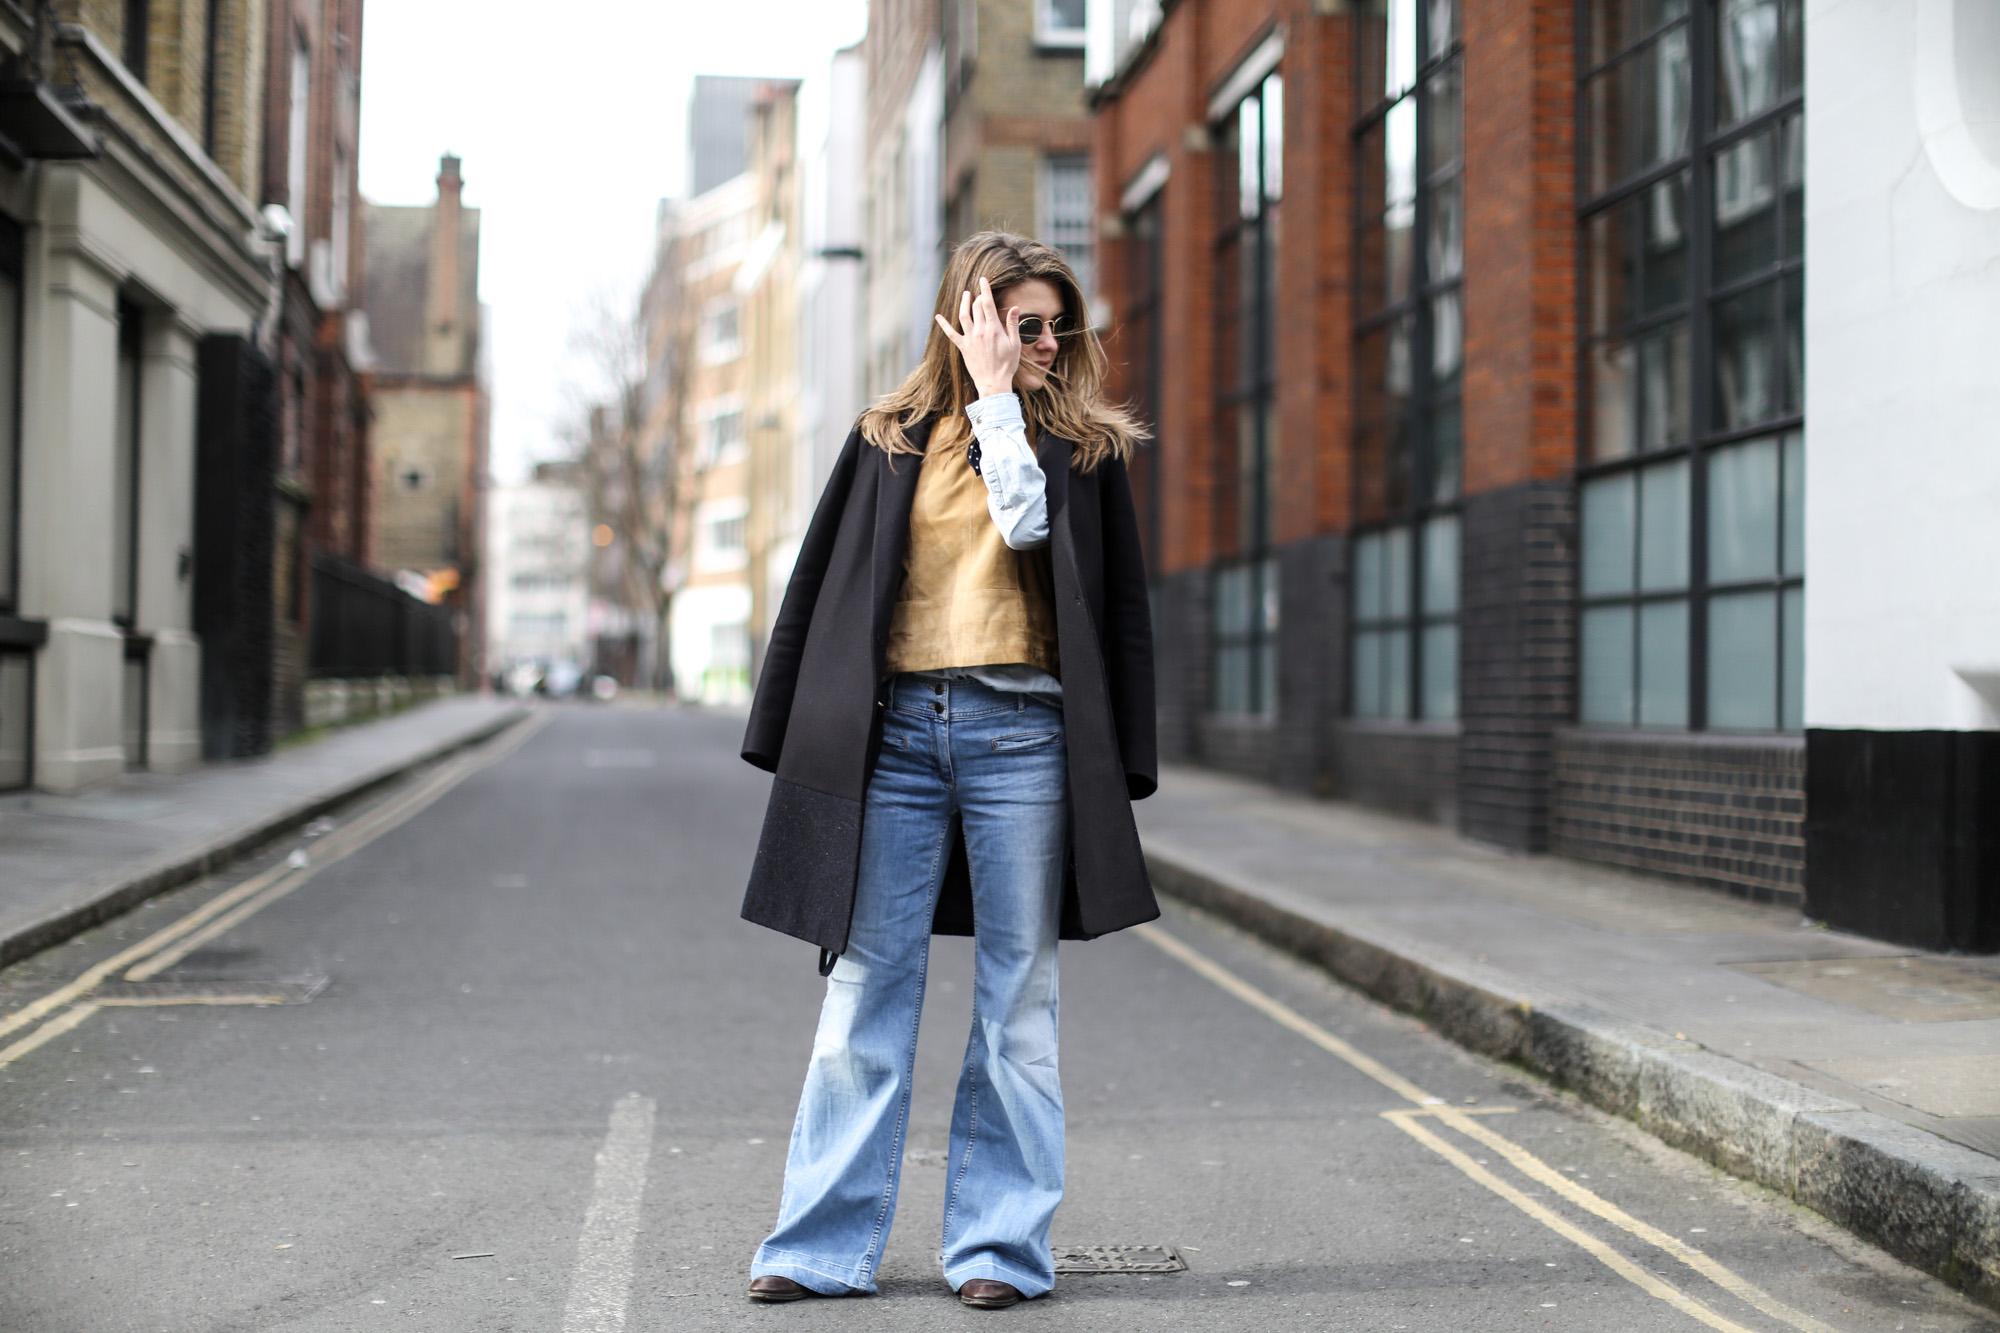 Clochet-wide-retro-jeans-suede-top-cos-coat